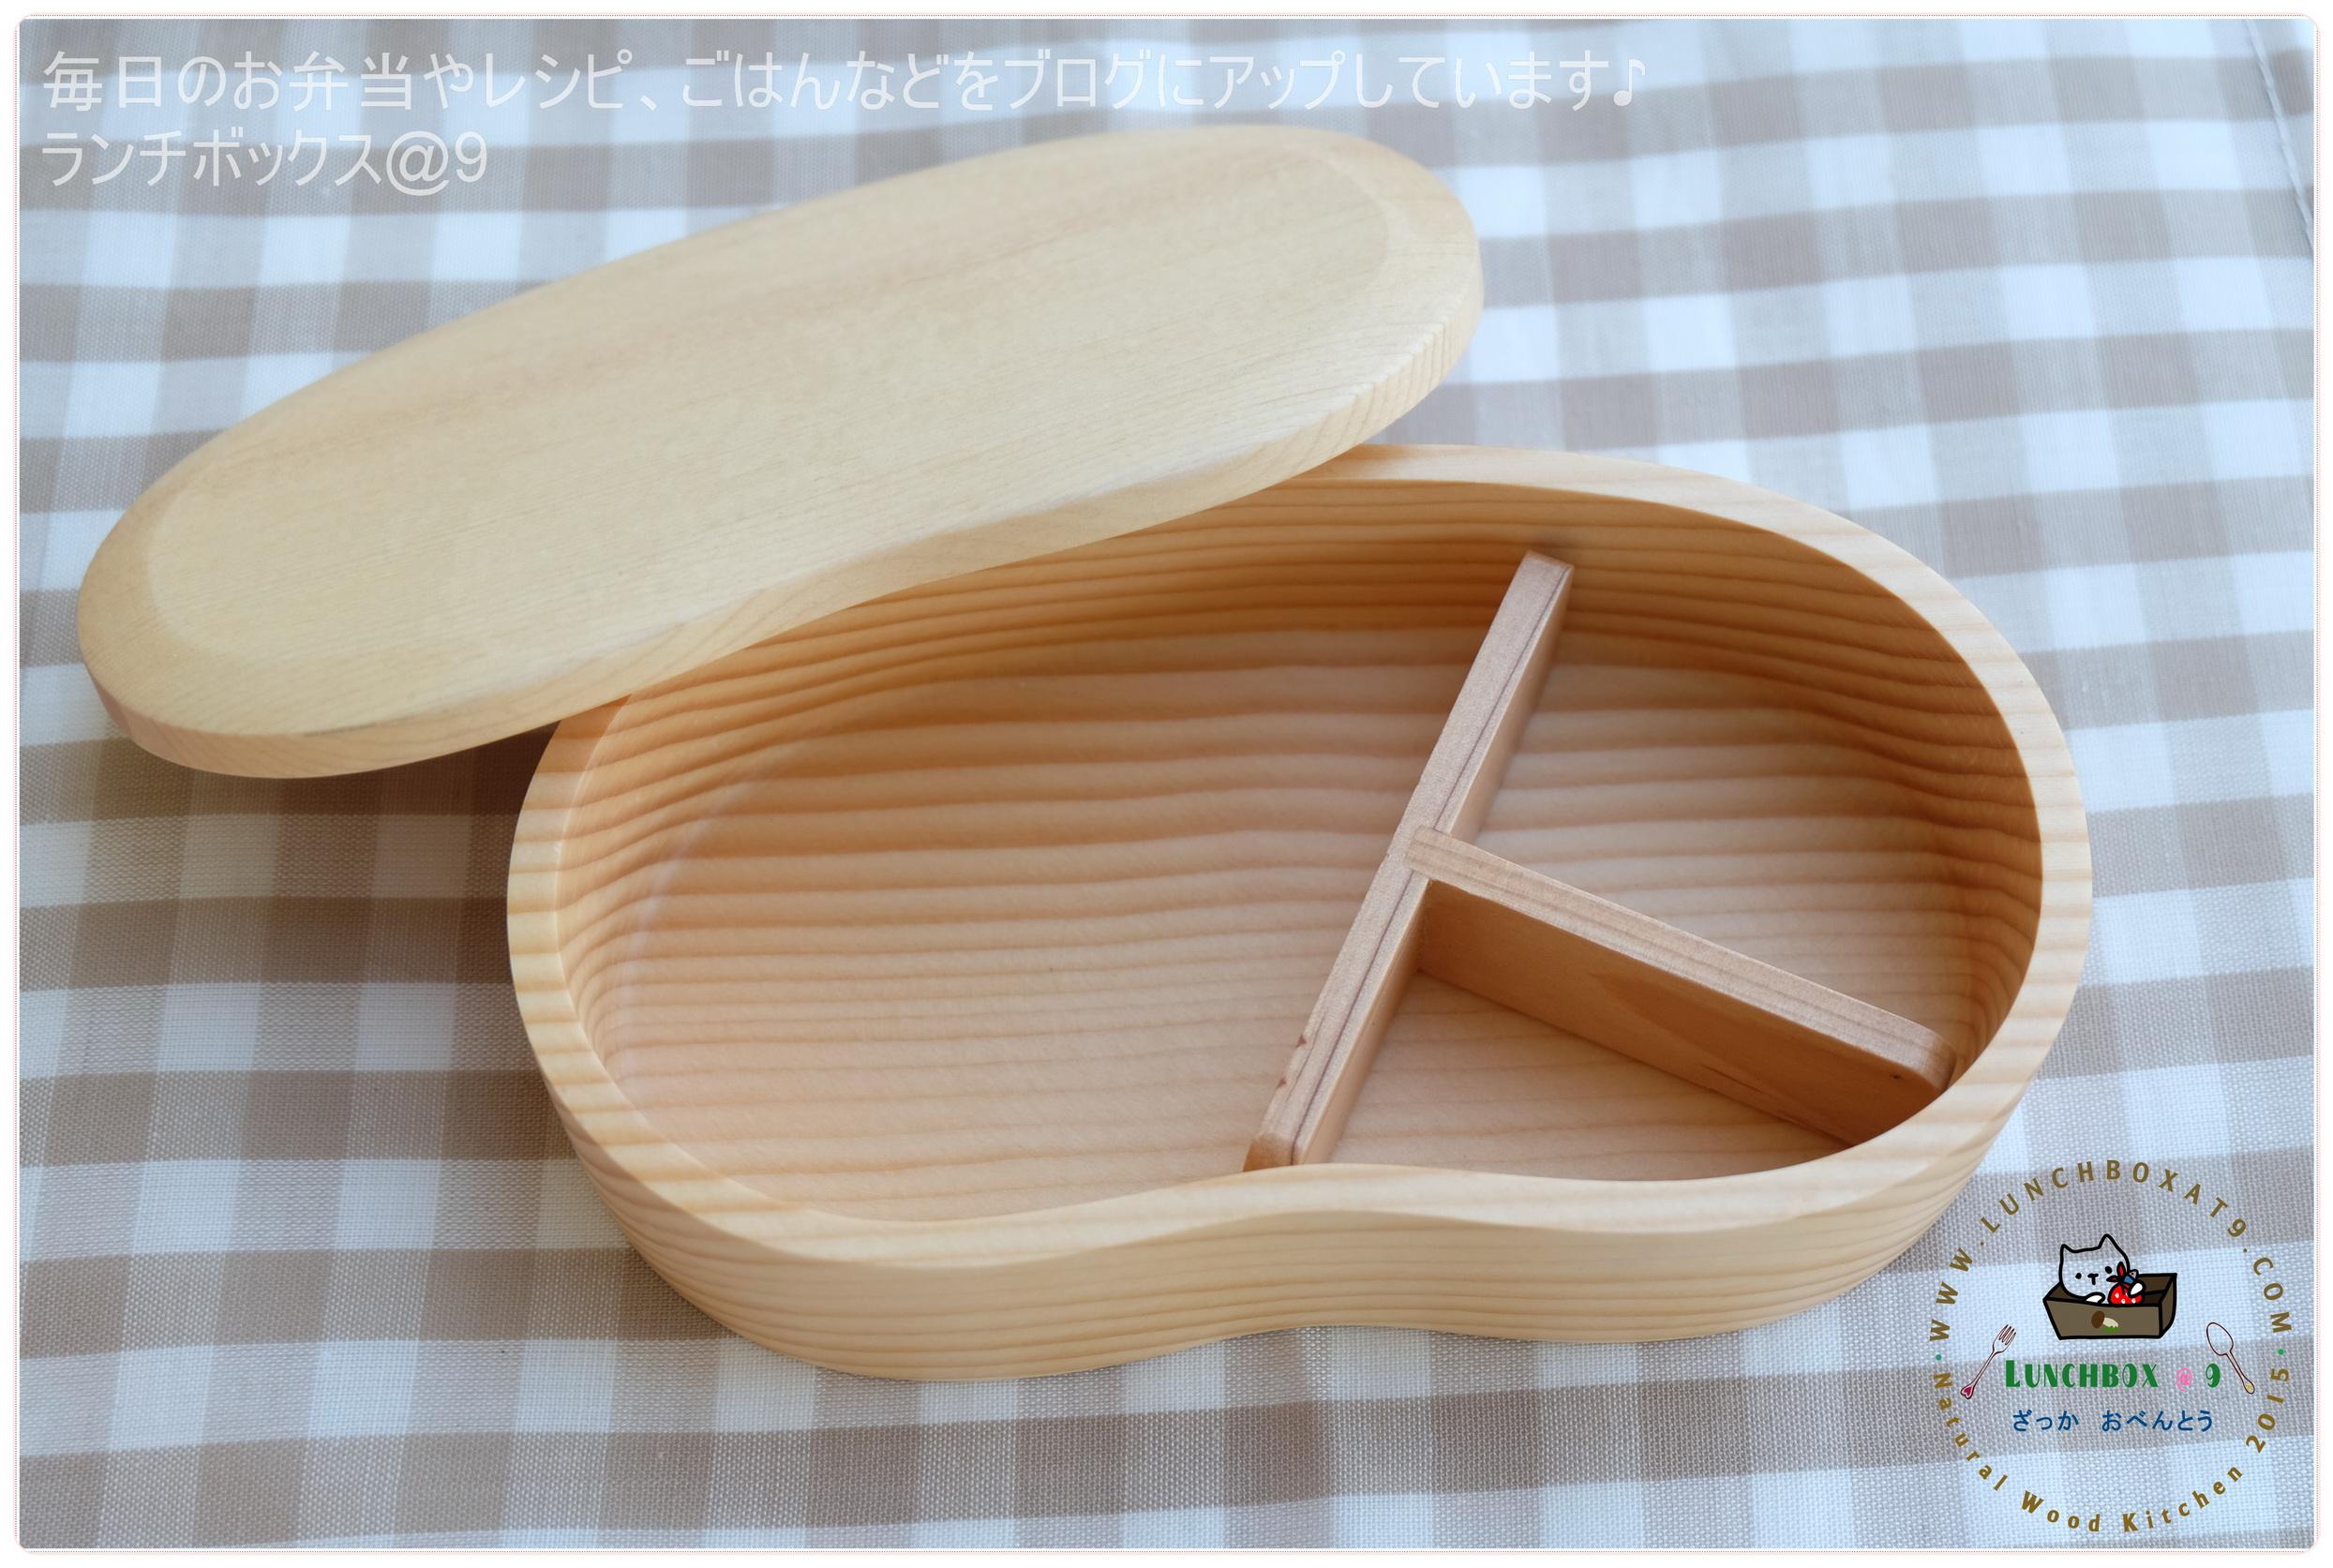 Soramame Shiraki Hemlock Bento Box กล่องข้าวญี่ปุ่นทรงถั่ว สีไม้ 1 ชั้น